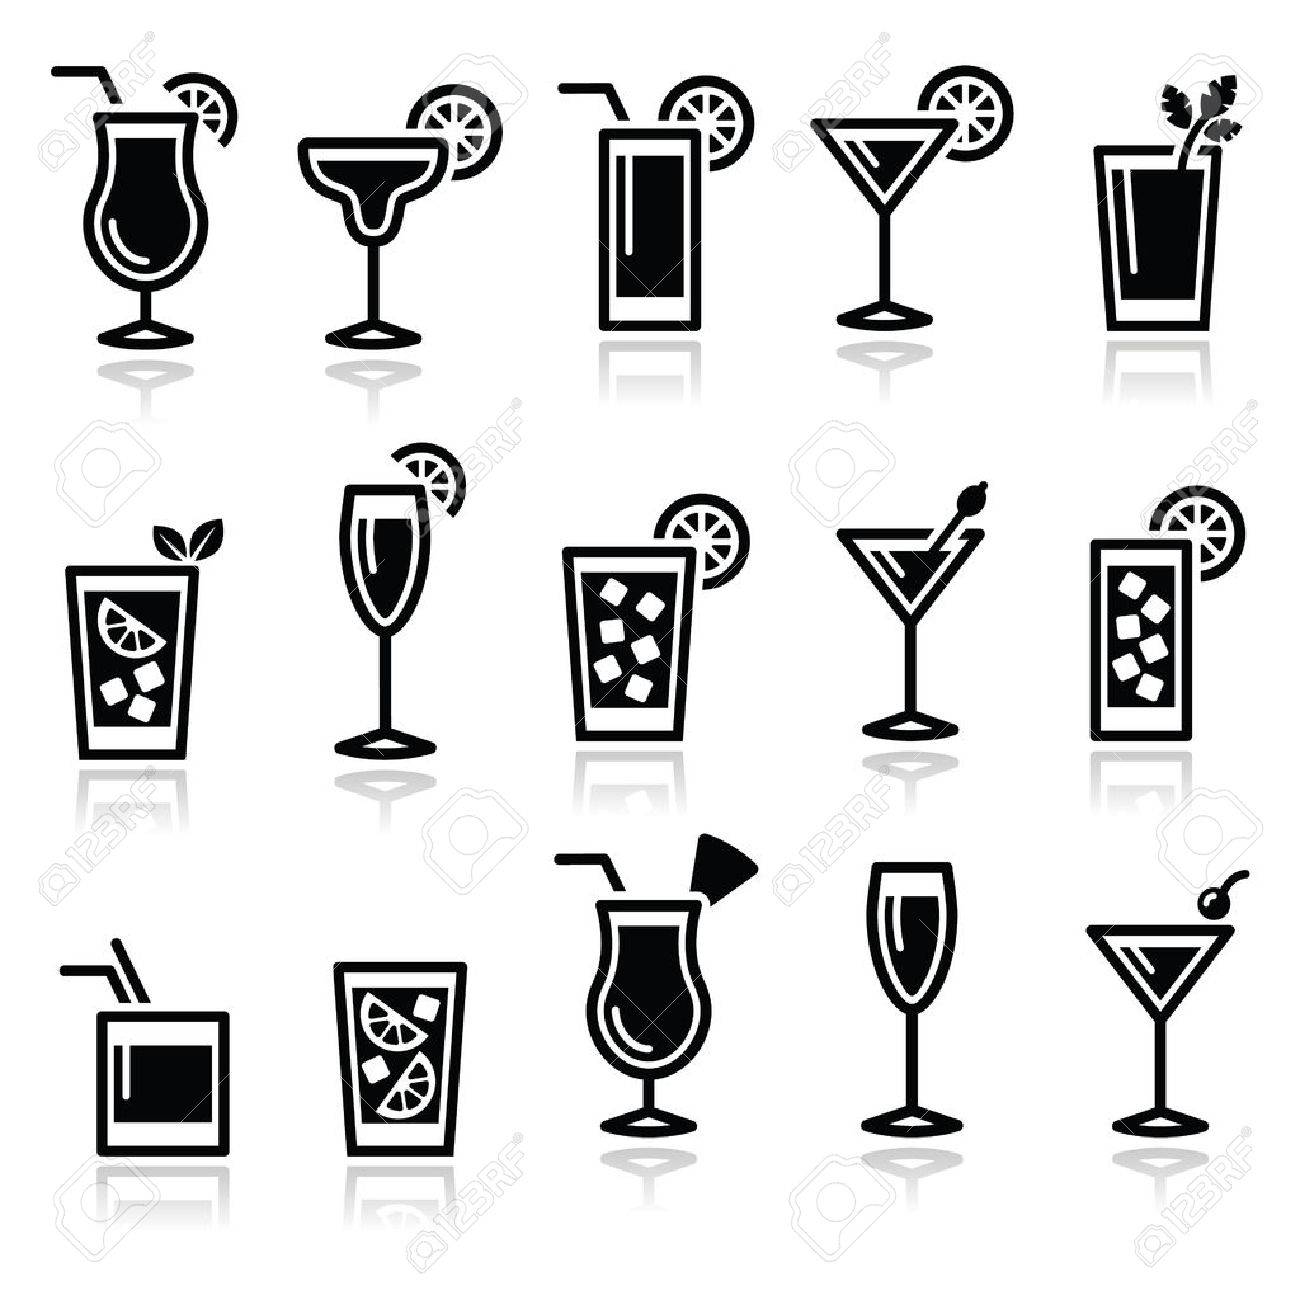 Cocktails, drinks glasses icons set - 31067232